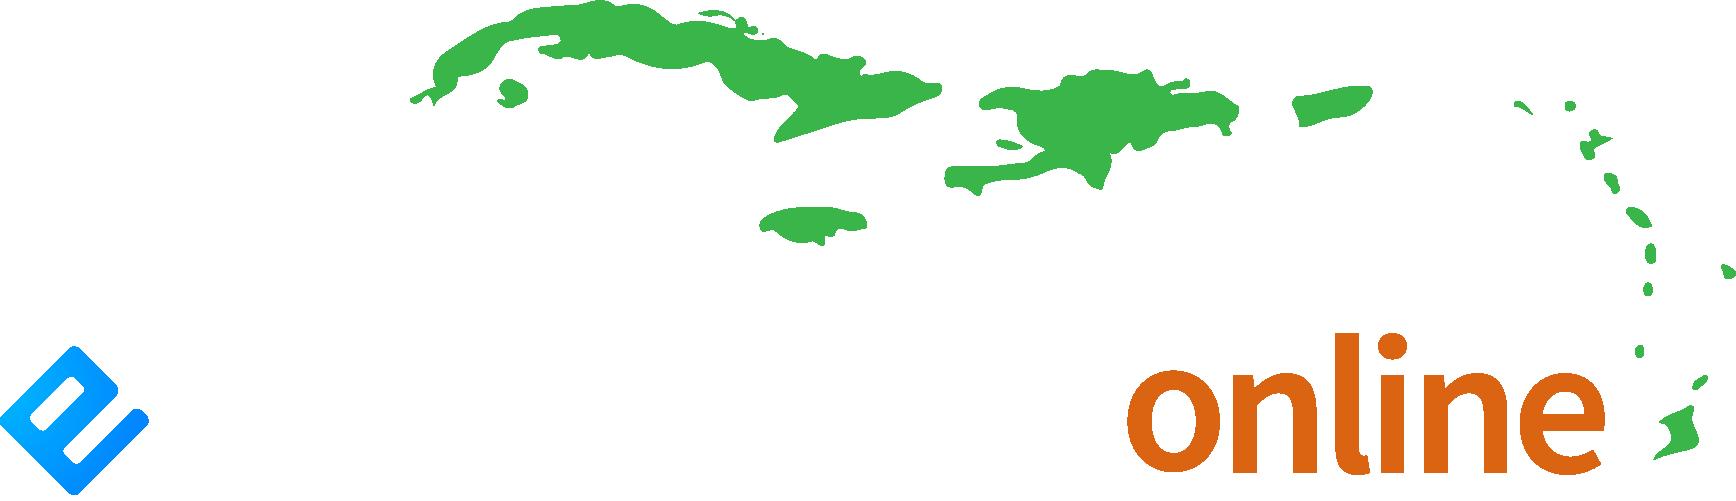 eCaribbeanOnline Logo